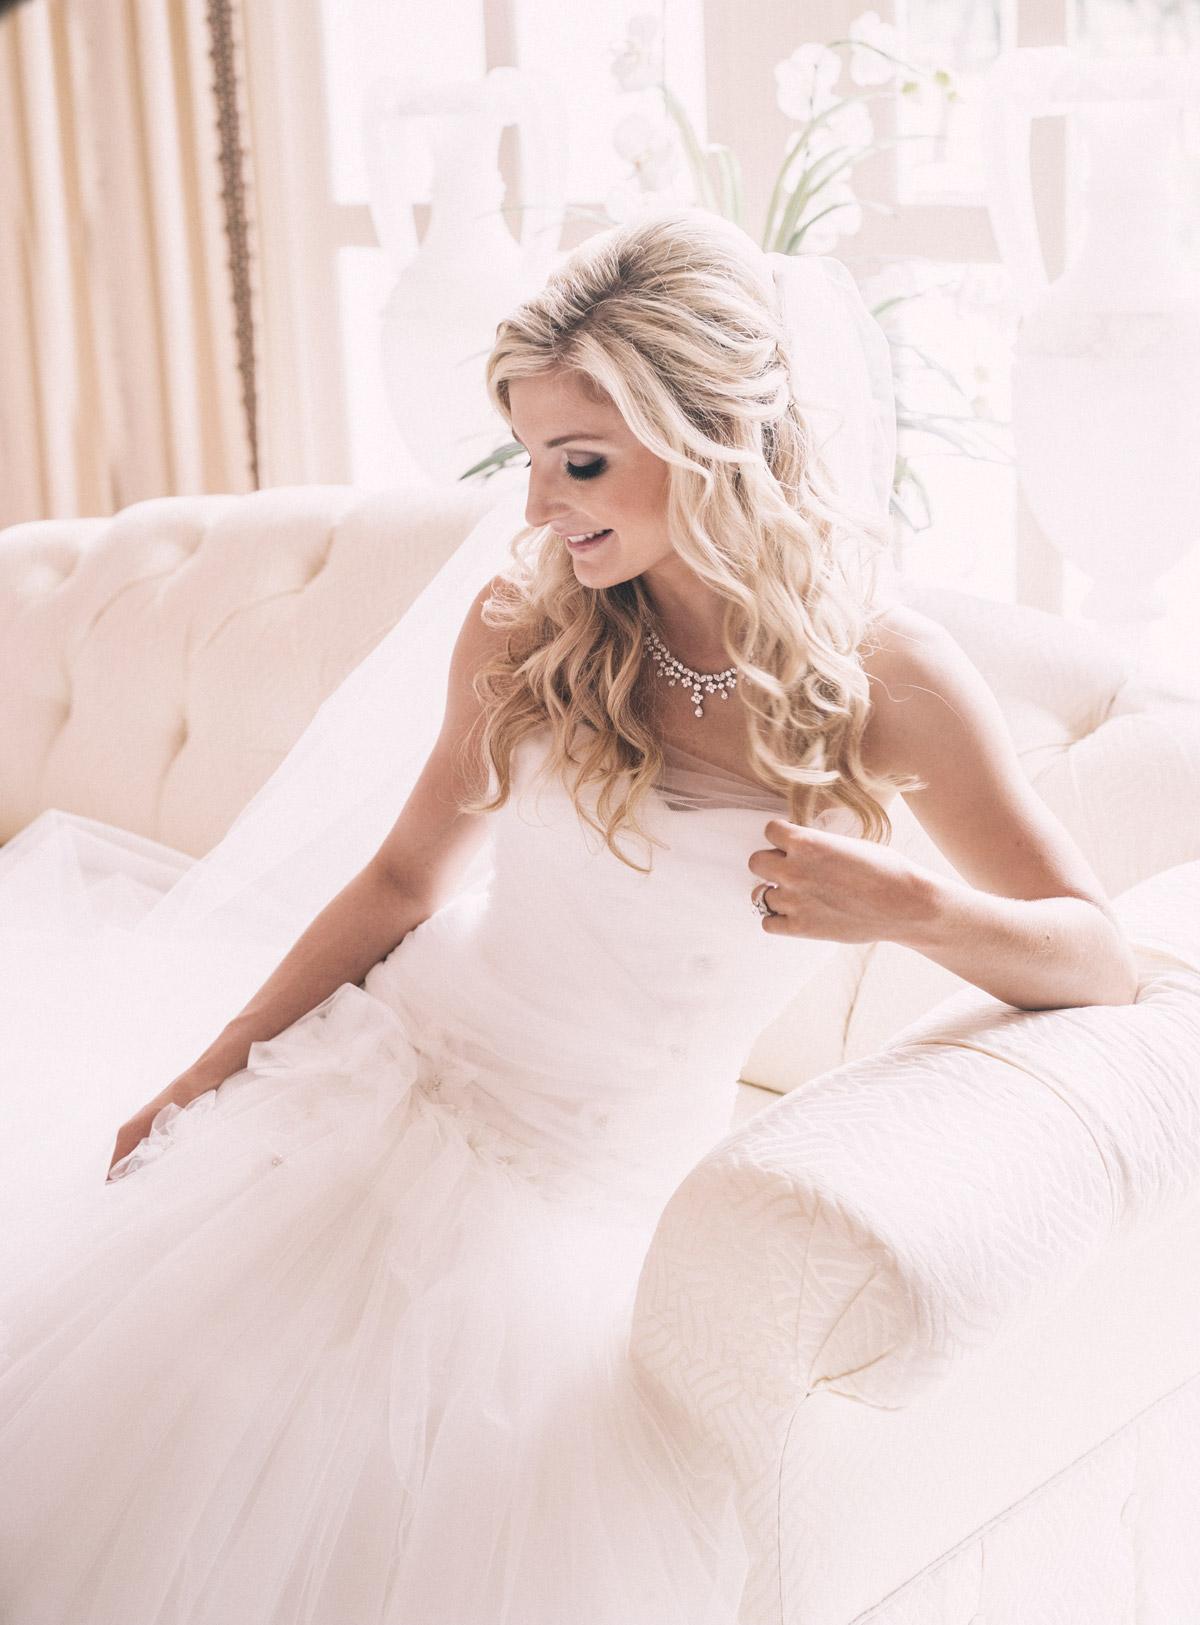 Marla  Wisteria gown | Houston, TX | 2013  J. Cogliandro Photography